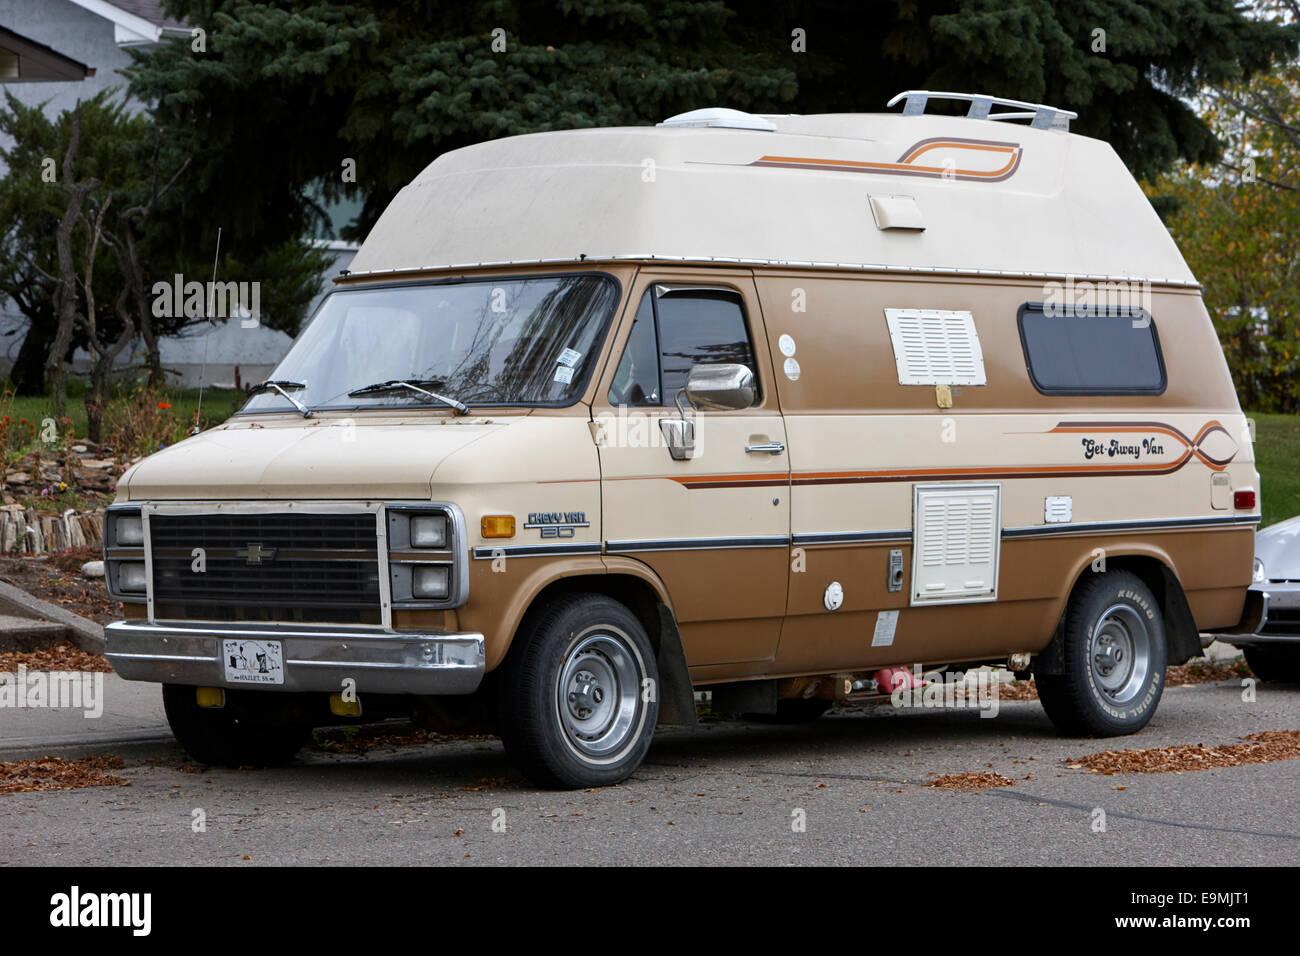 Brown Chevy Van 80 Get Away Small Camper Saskatchewan Canada